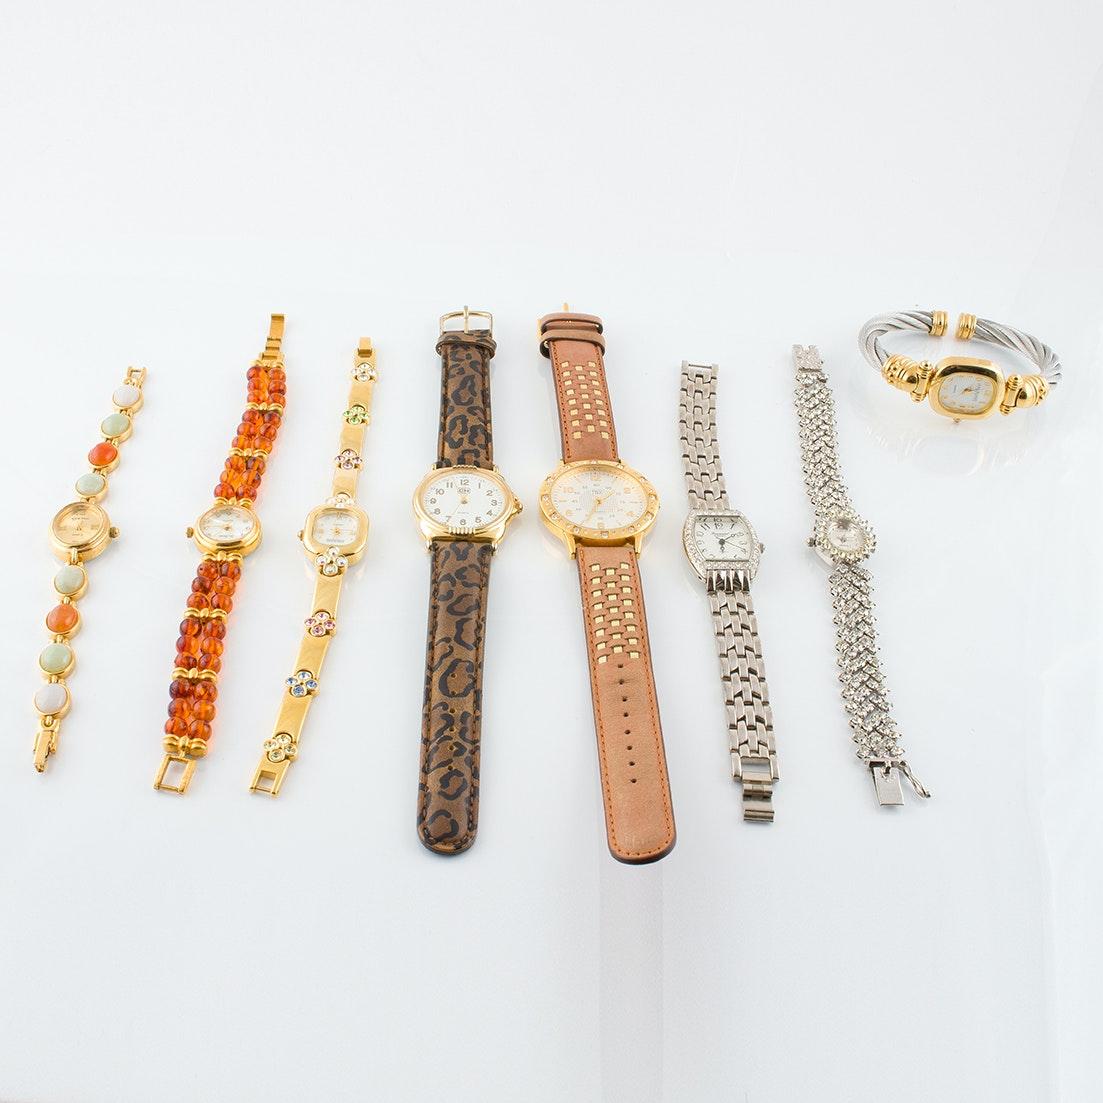 Gruen and Joan Rivers Wristwatches